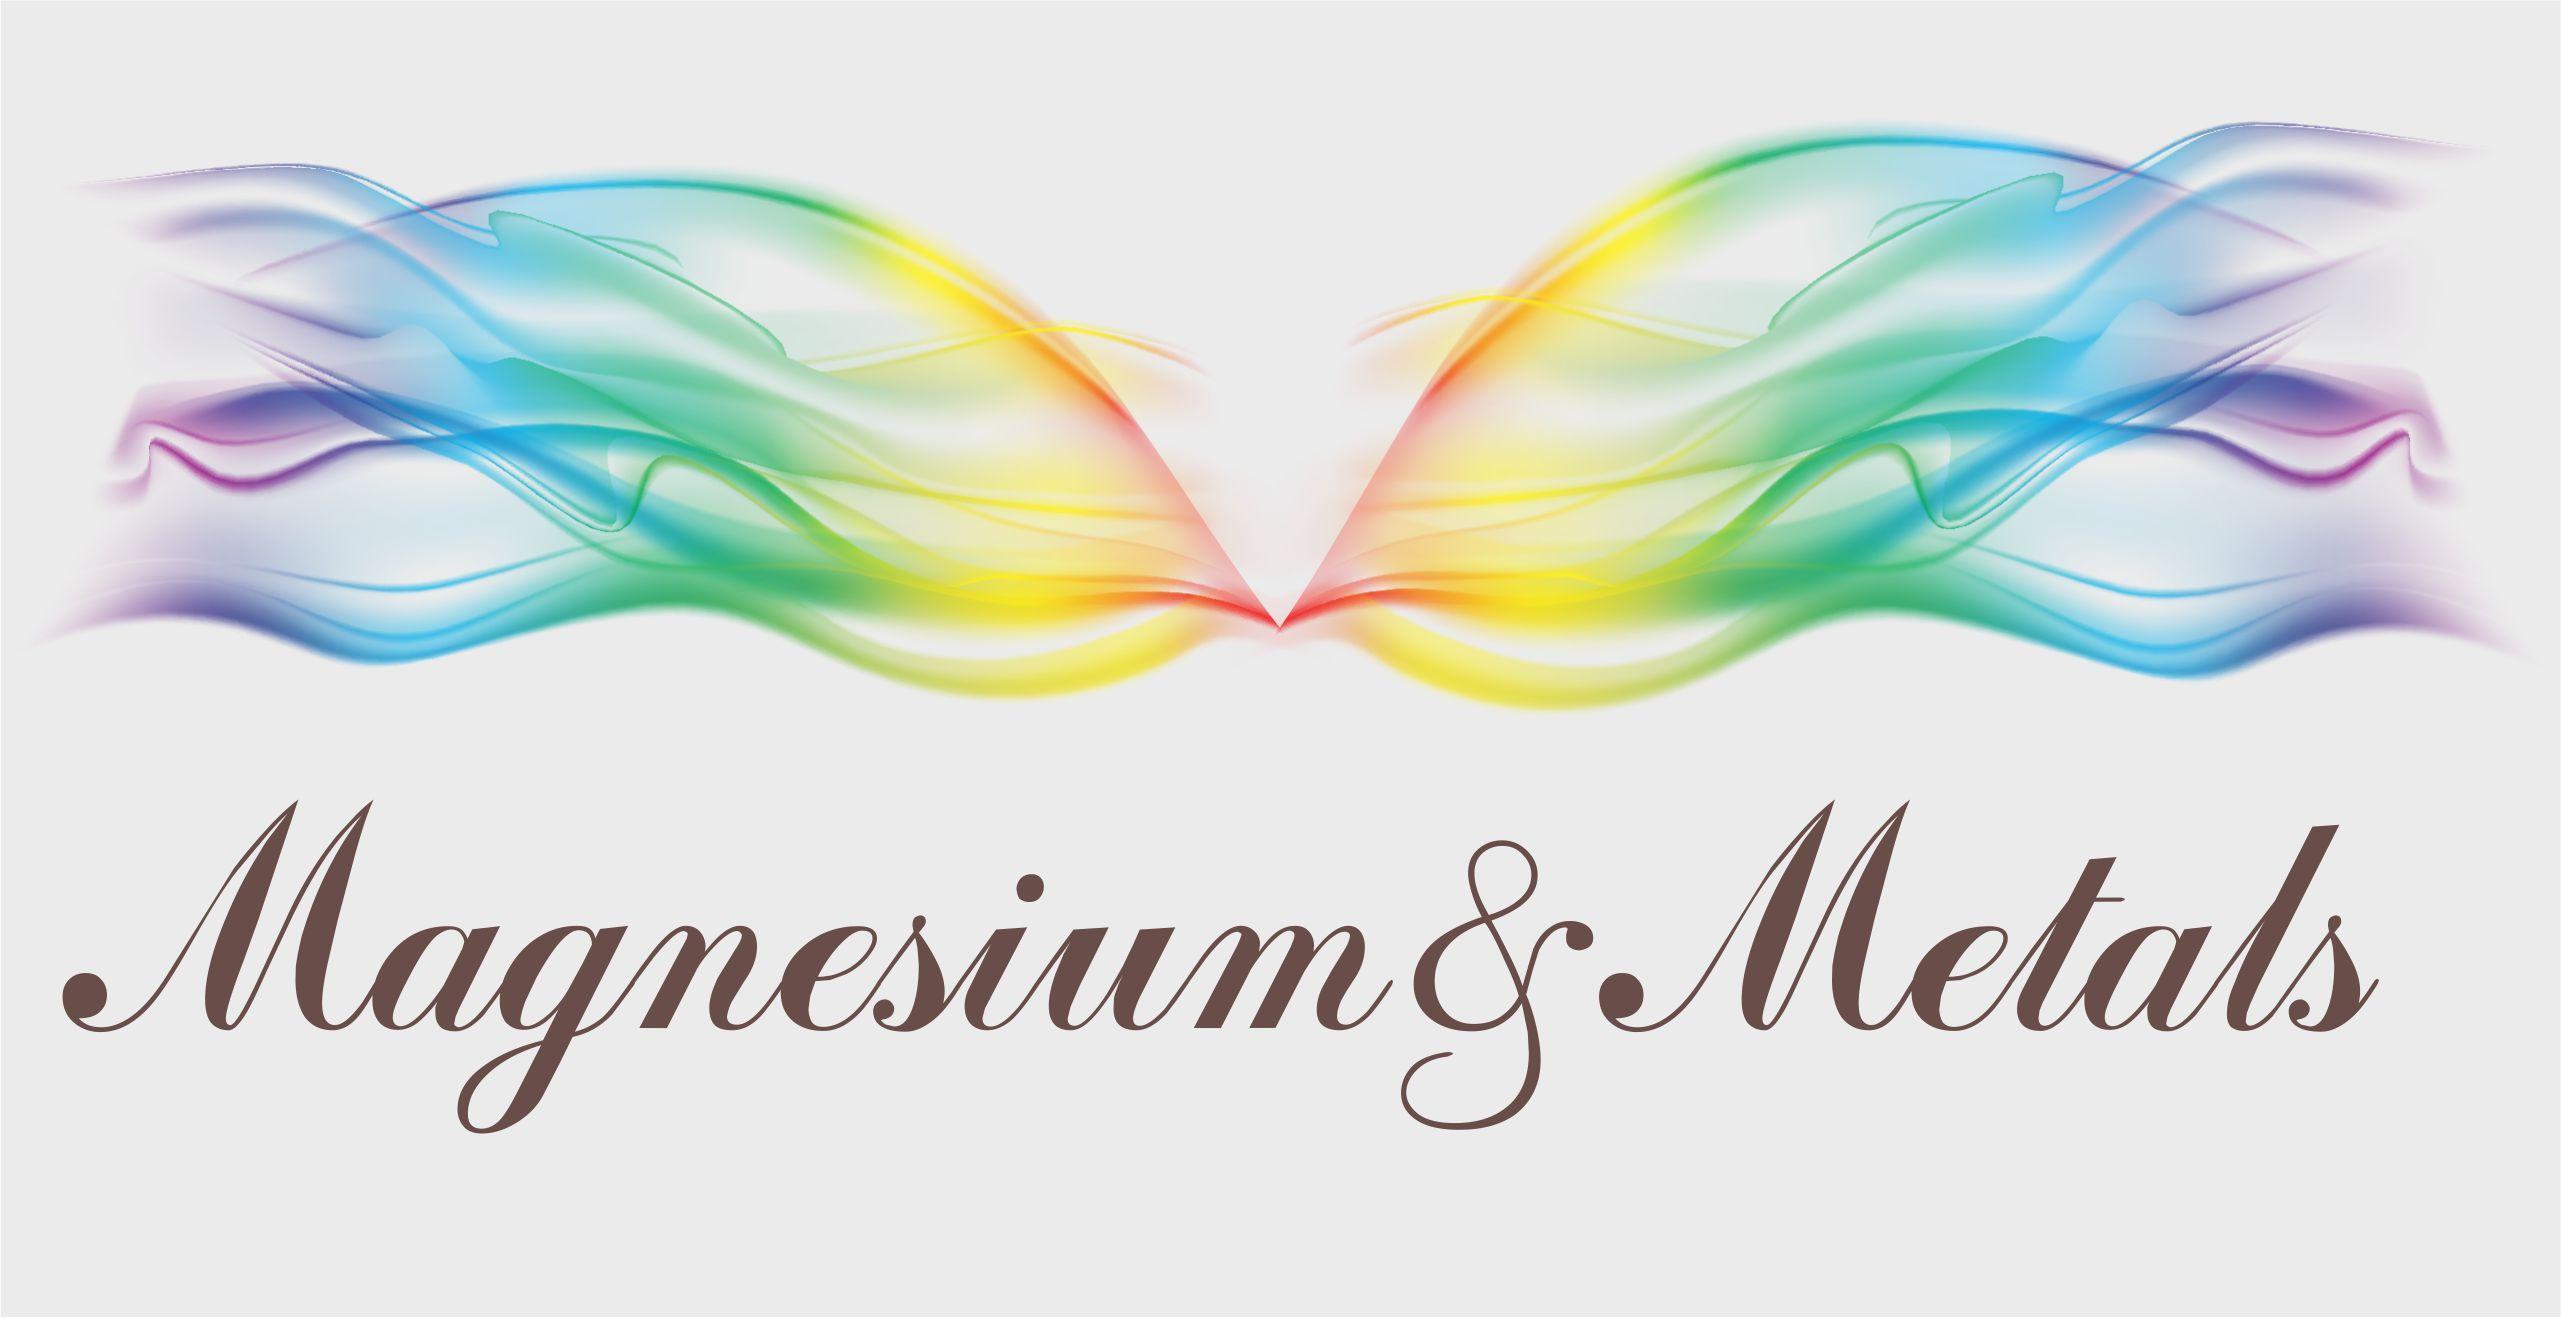 Логотип для проекта Magnesium&Metals фото f_4ea01332a1bc0.jpg